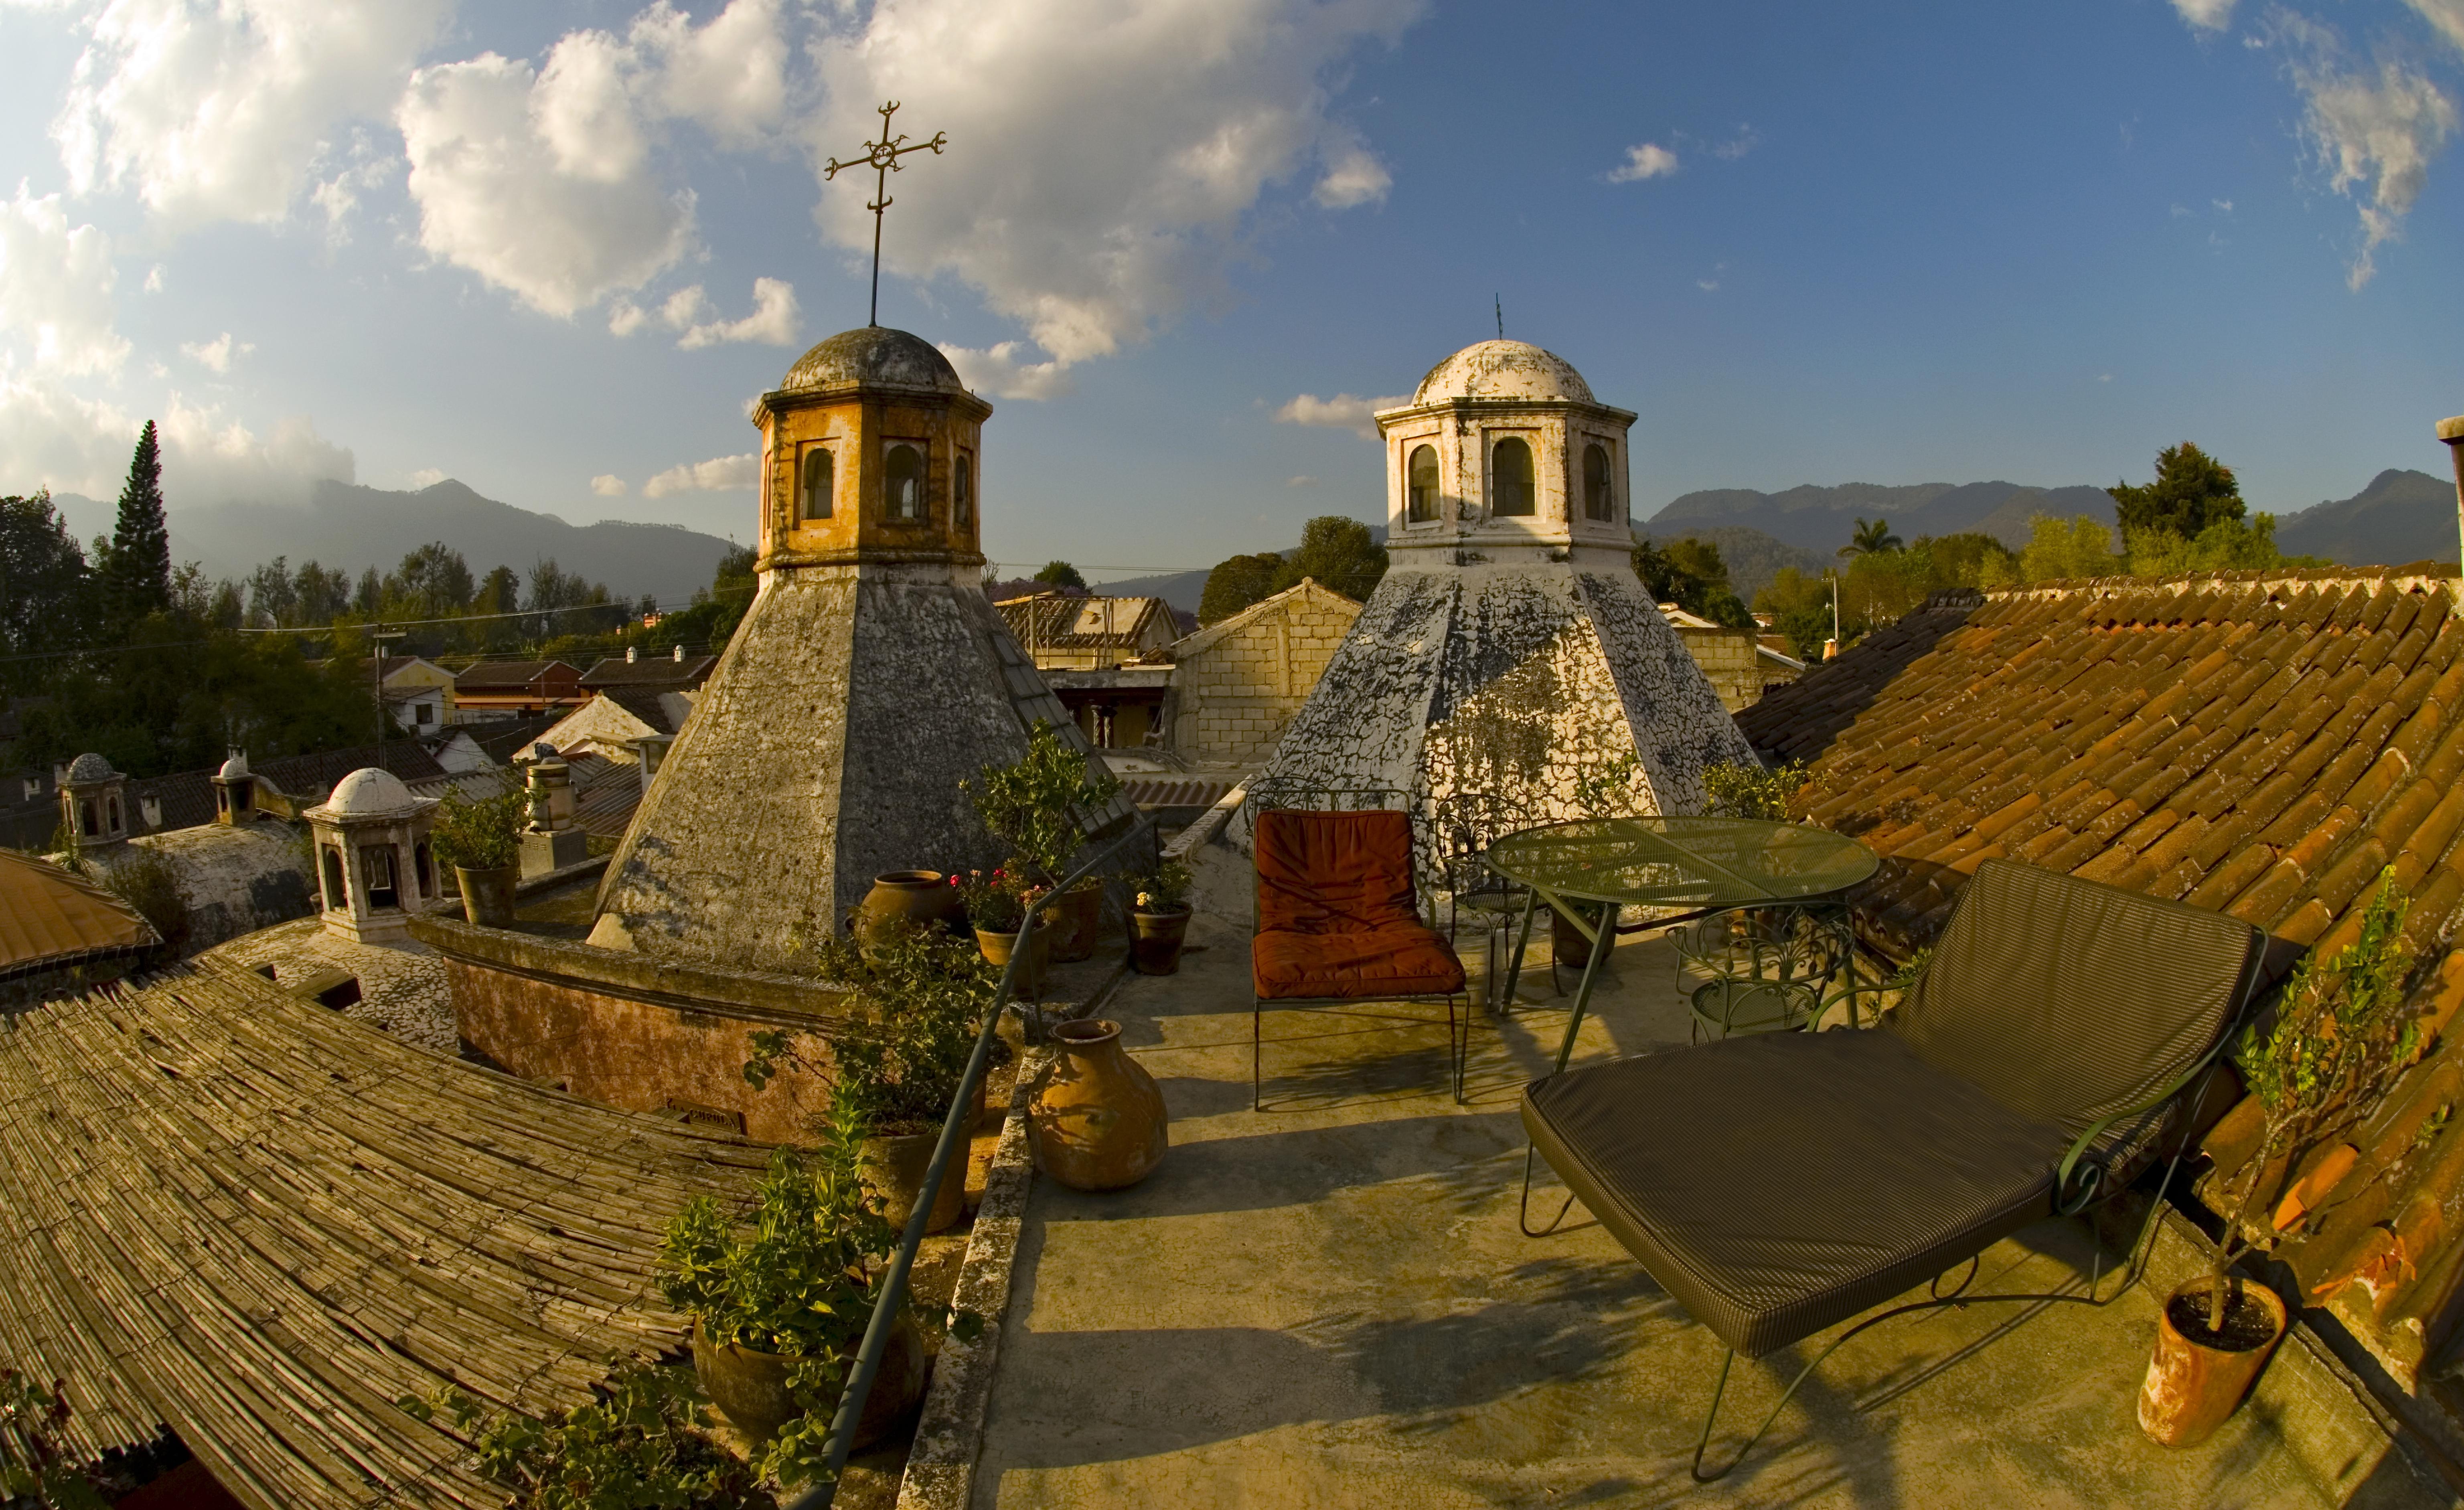 Meson Panza Verde Terrace View